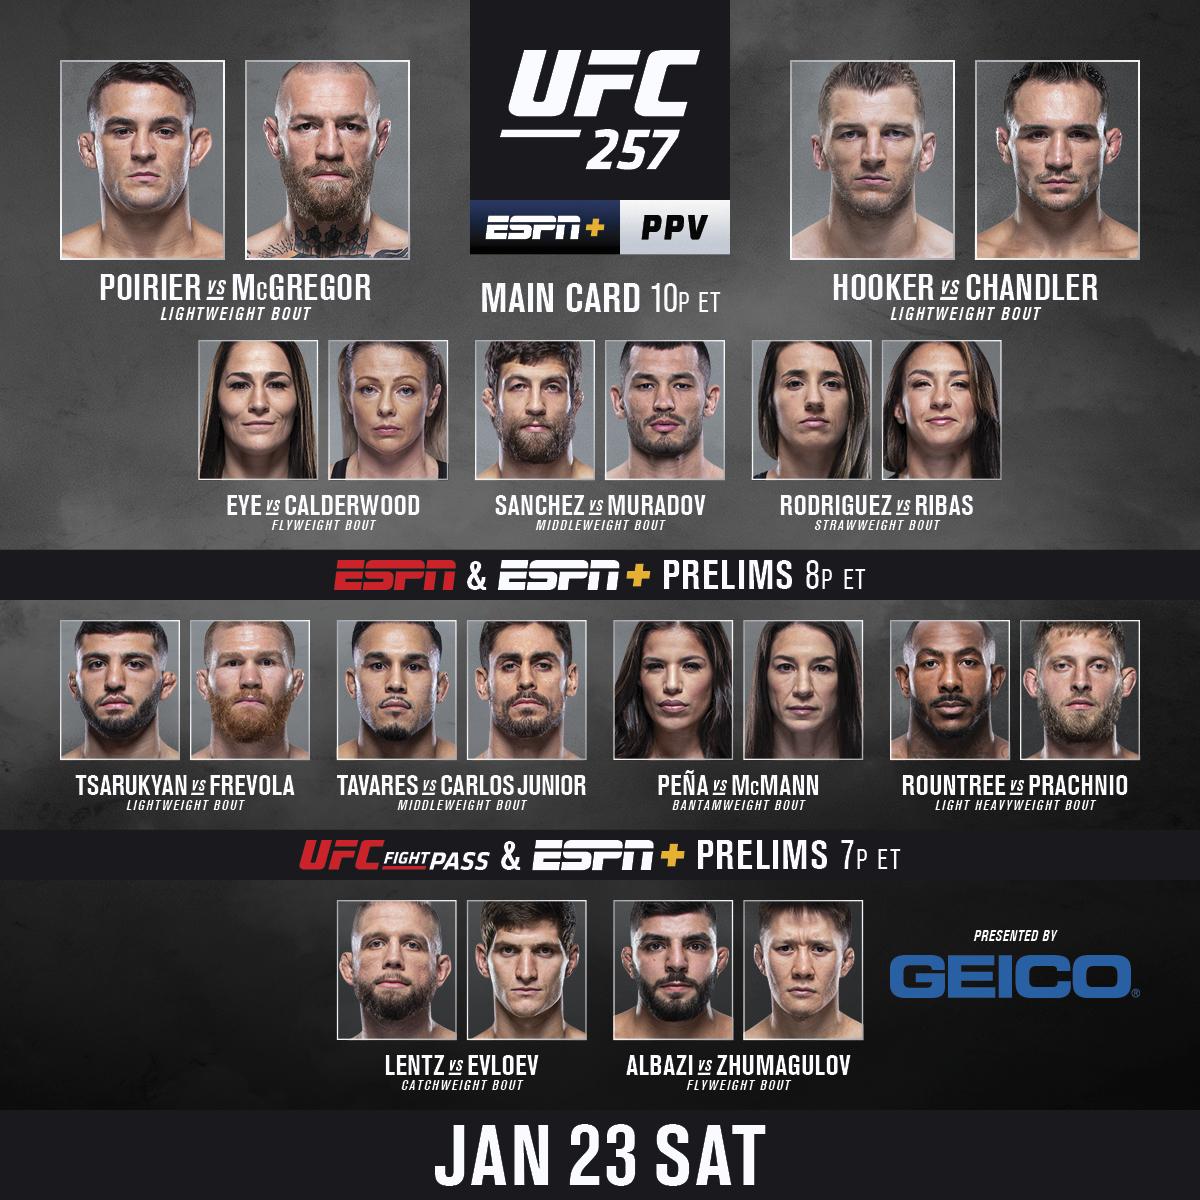 RT b/c IT'S FIGHT DAY 🗣  💎 @DustinPoirier vs 🇮🇪 @TheNotoriousMMA   [ Get the #UFC257 PPV: https://t.co/ZSsZOYmZMy | B2YB @GEICO ] https://t.co/4gBueQ6S22